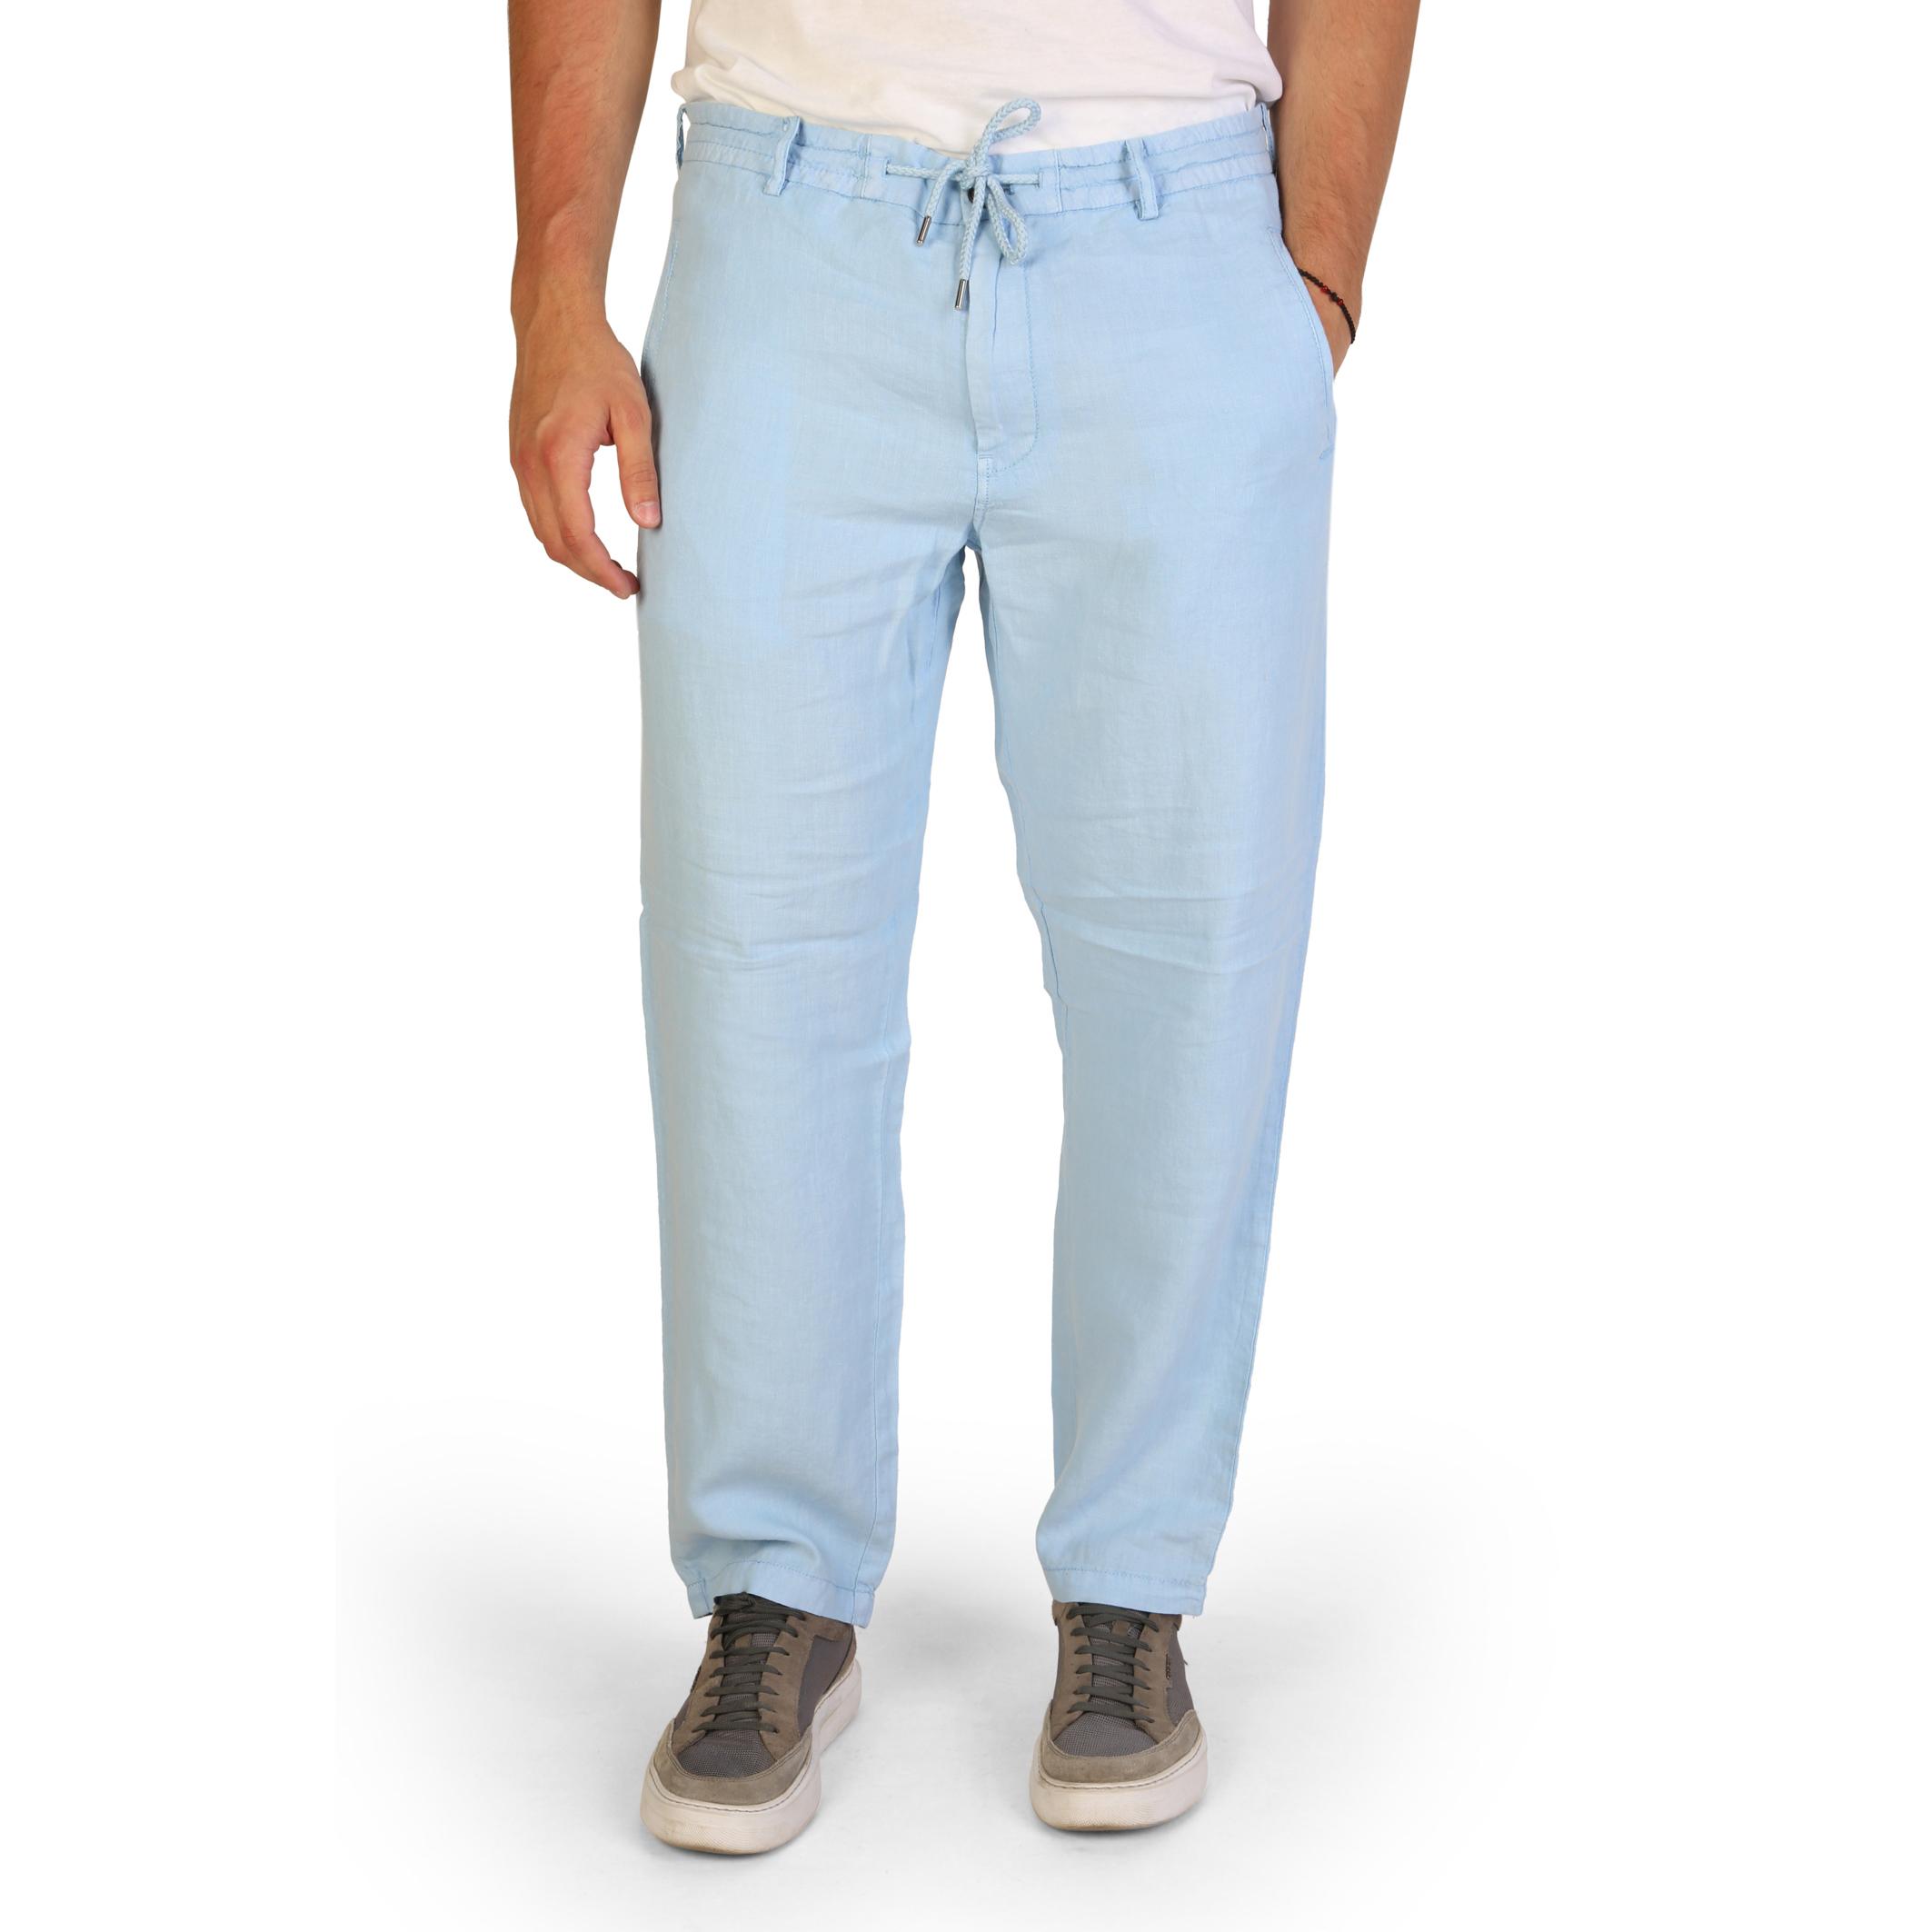 Armani Jeans 3Y6P56_6NDMZ Uomo Blu 107809Armani Jeans